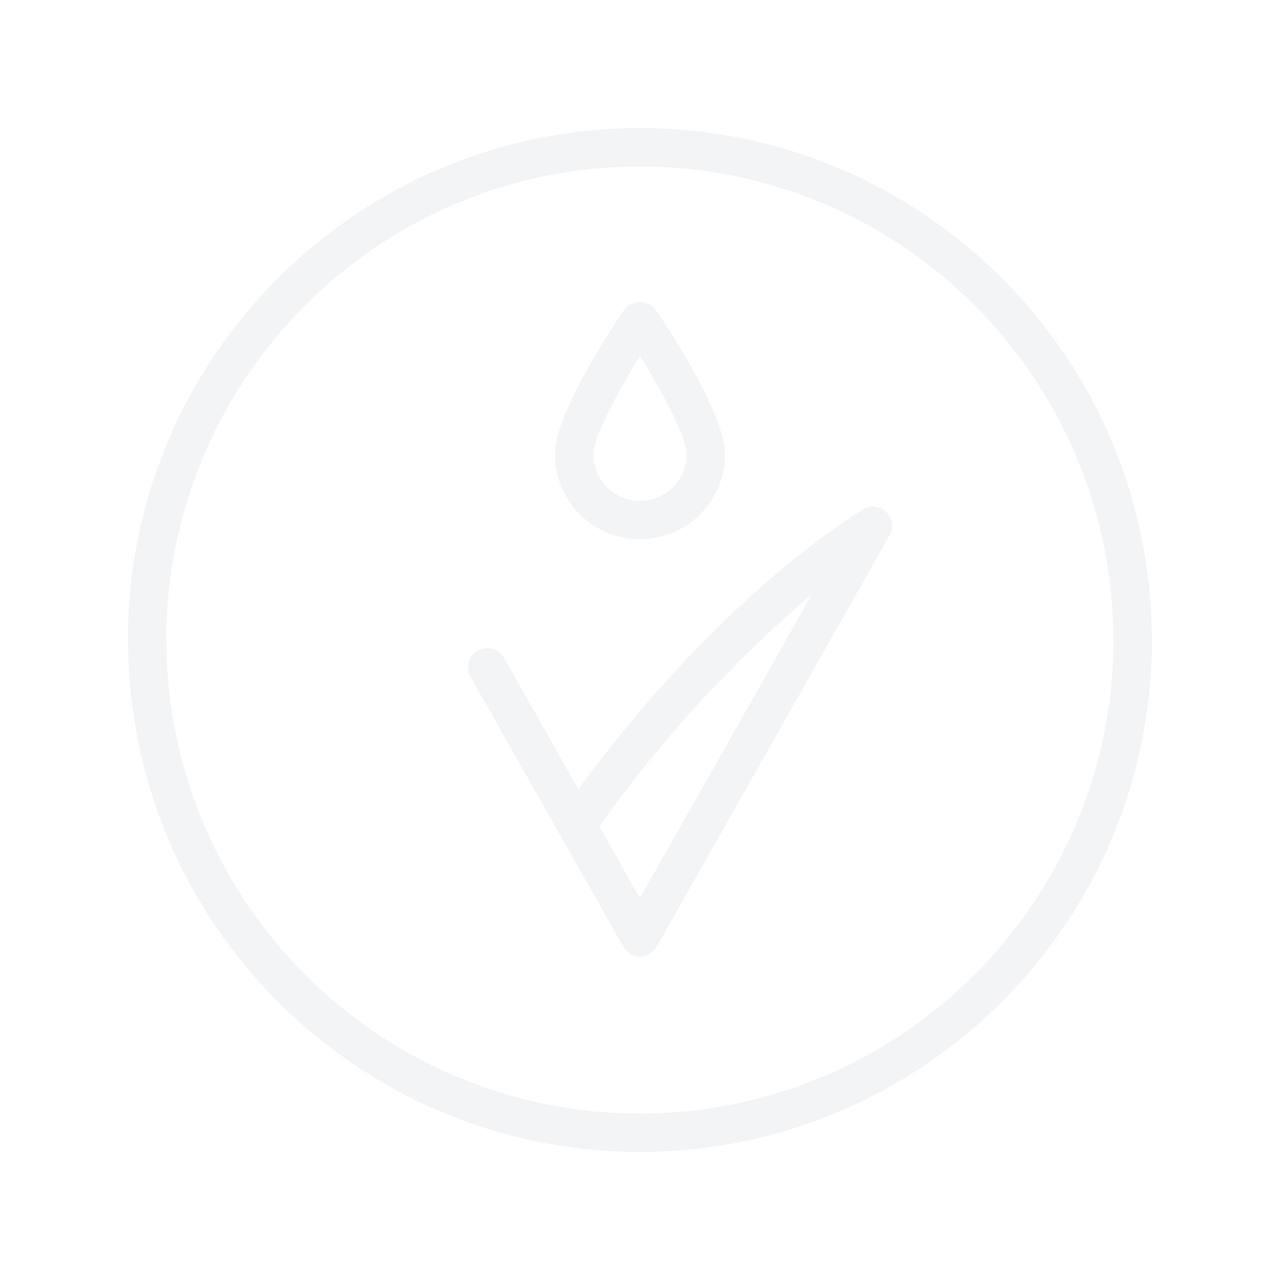 ALESSANDRO Striplac Shimmer Gift Set